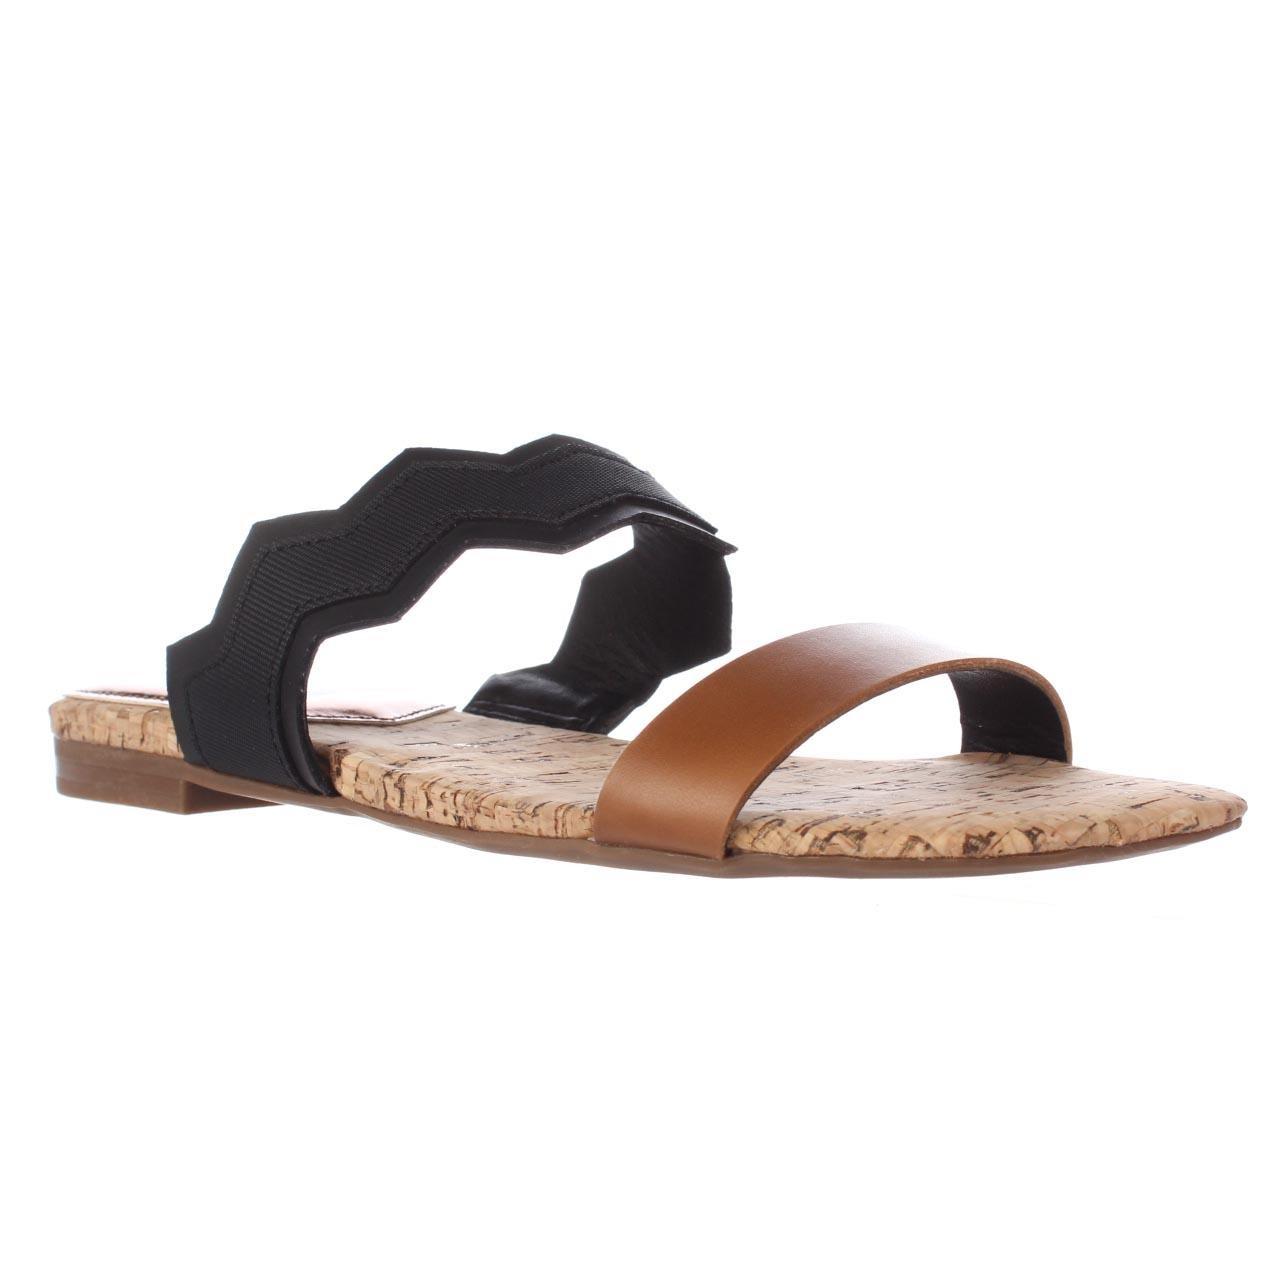 Para mujer Gia Slide Sandal Black Size 6.5 hAXjJIznQt